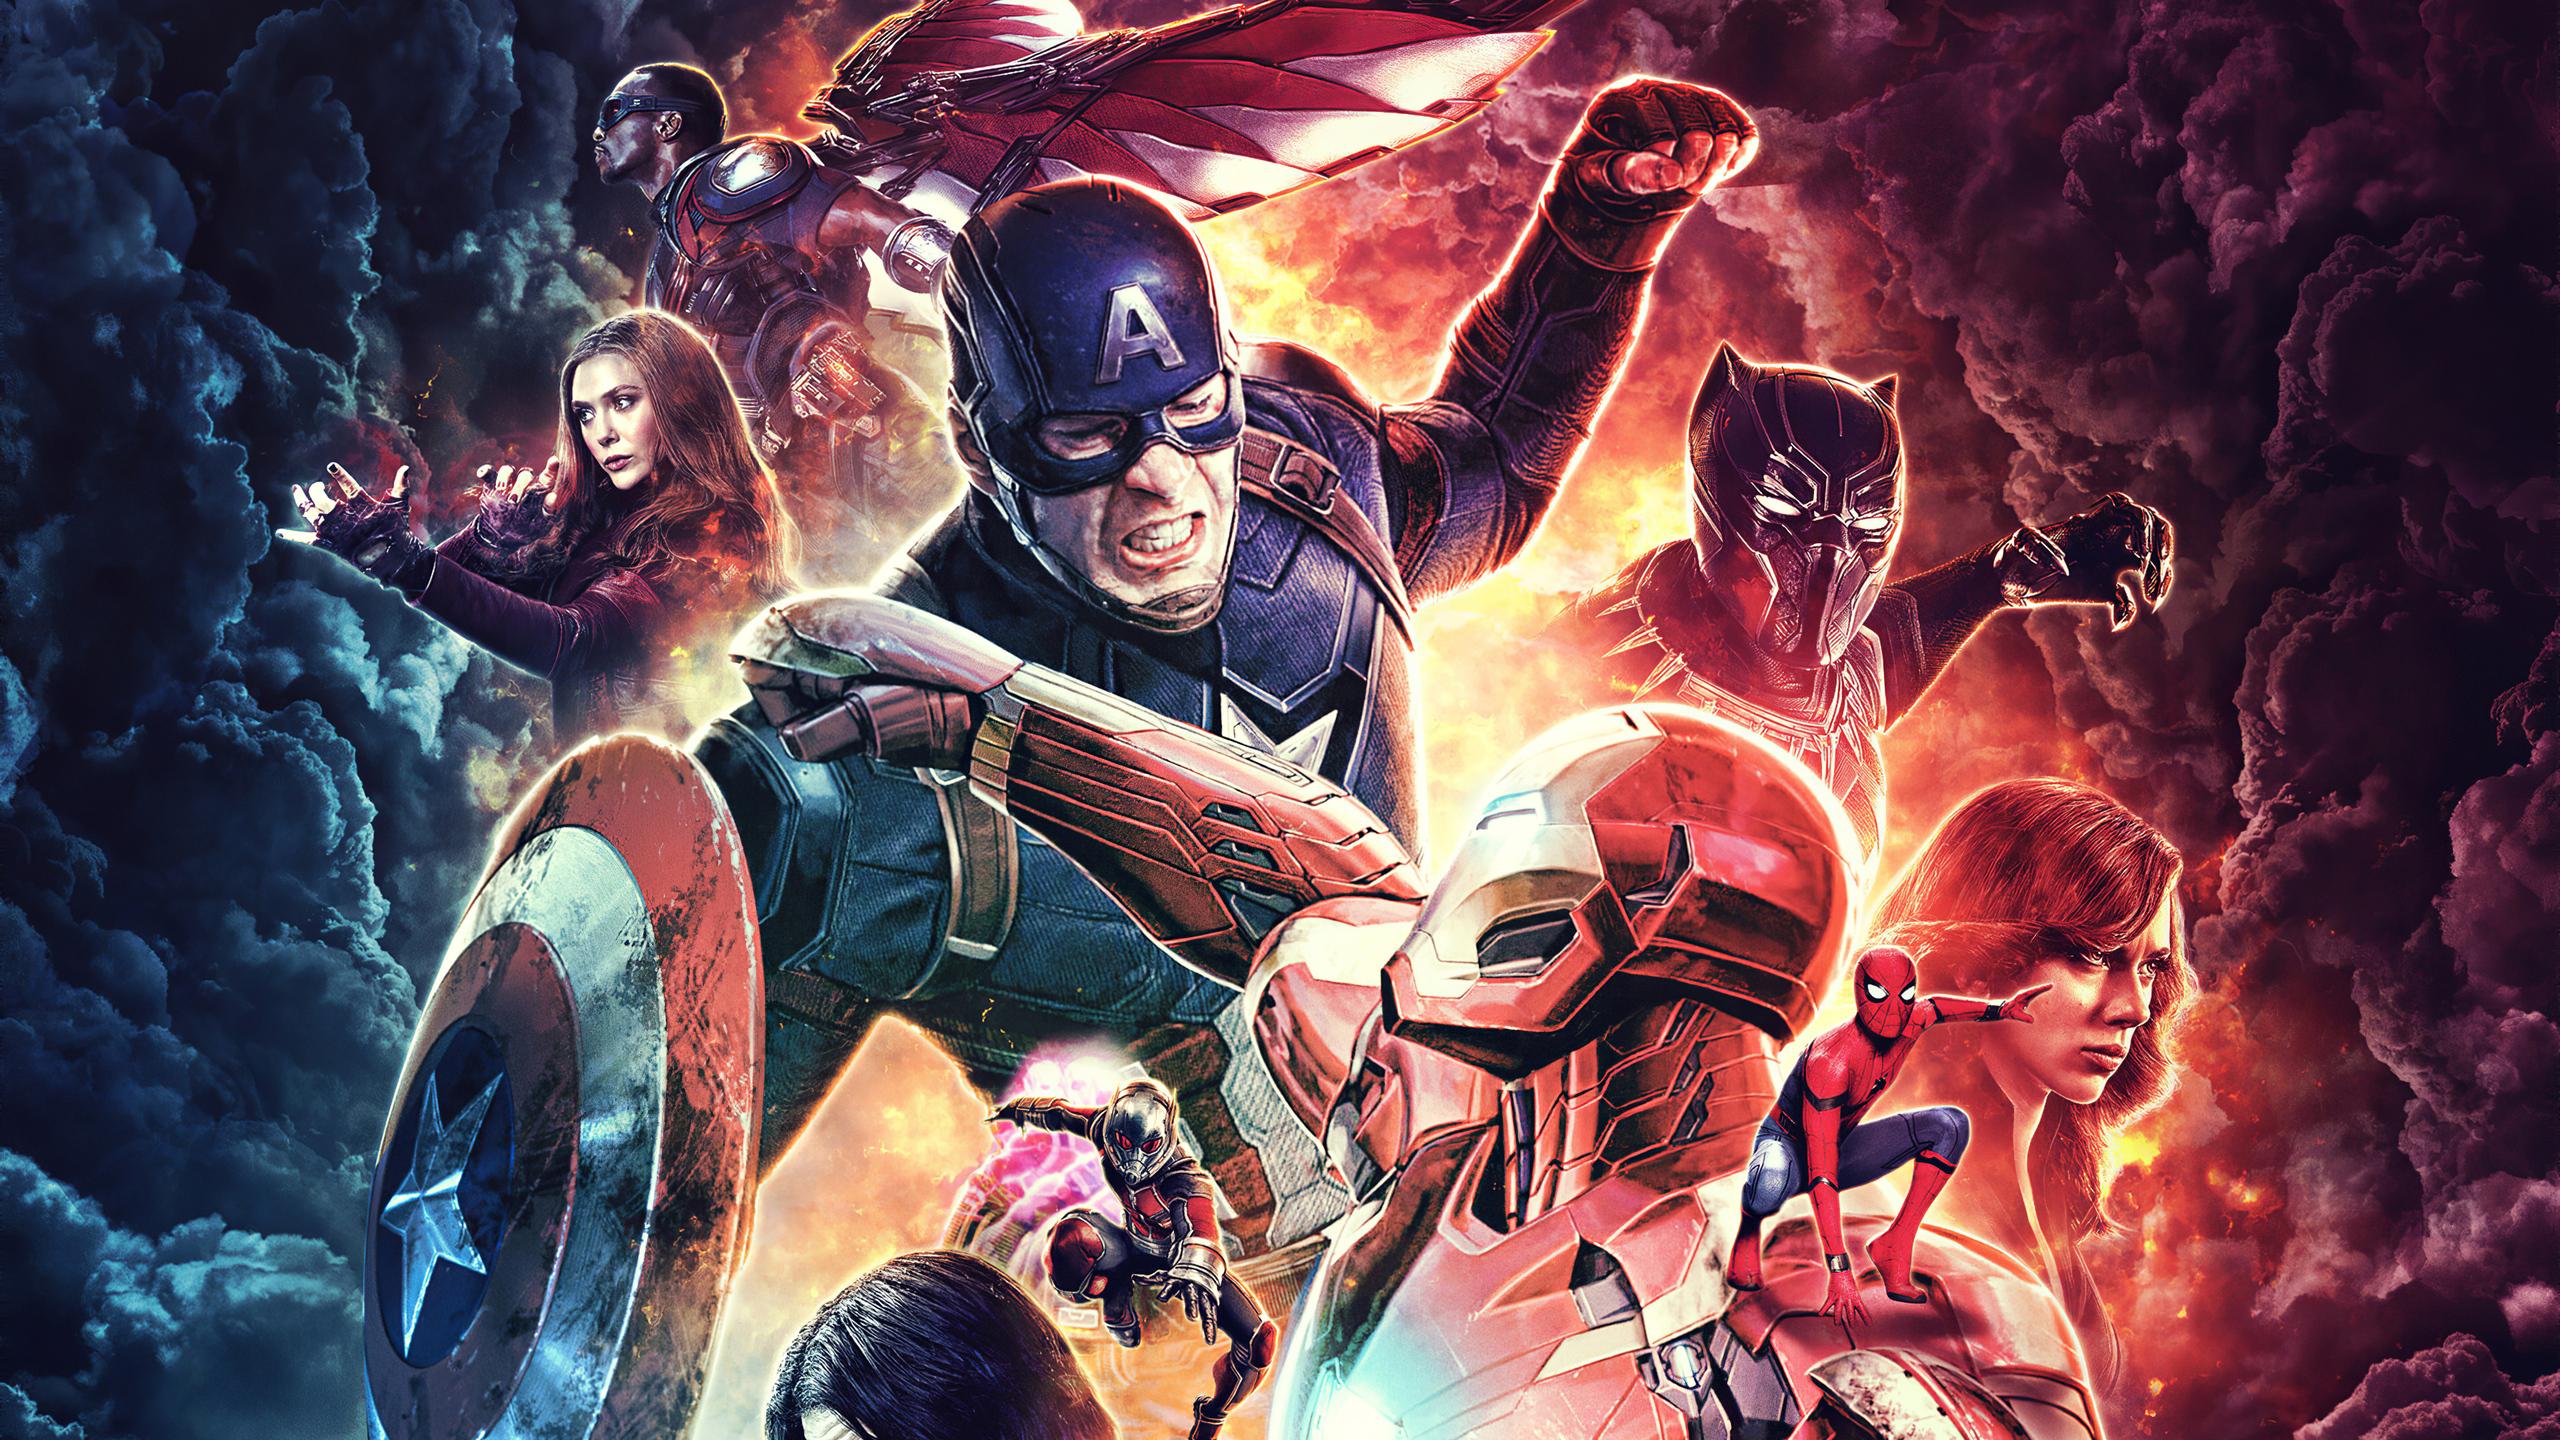 2560x1440 Captain America Civil War 4k Poster 1440p Resolution Hd